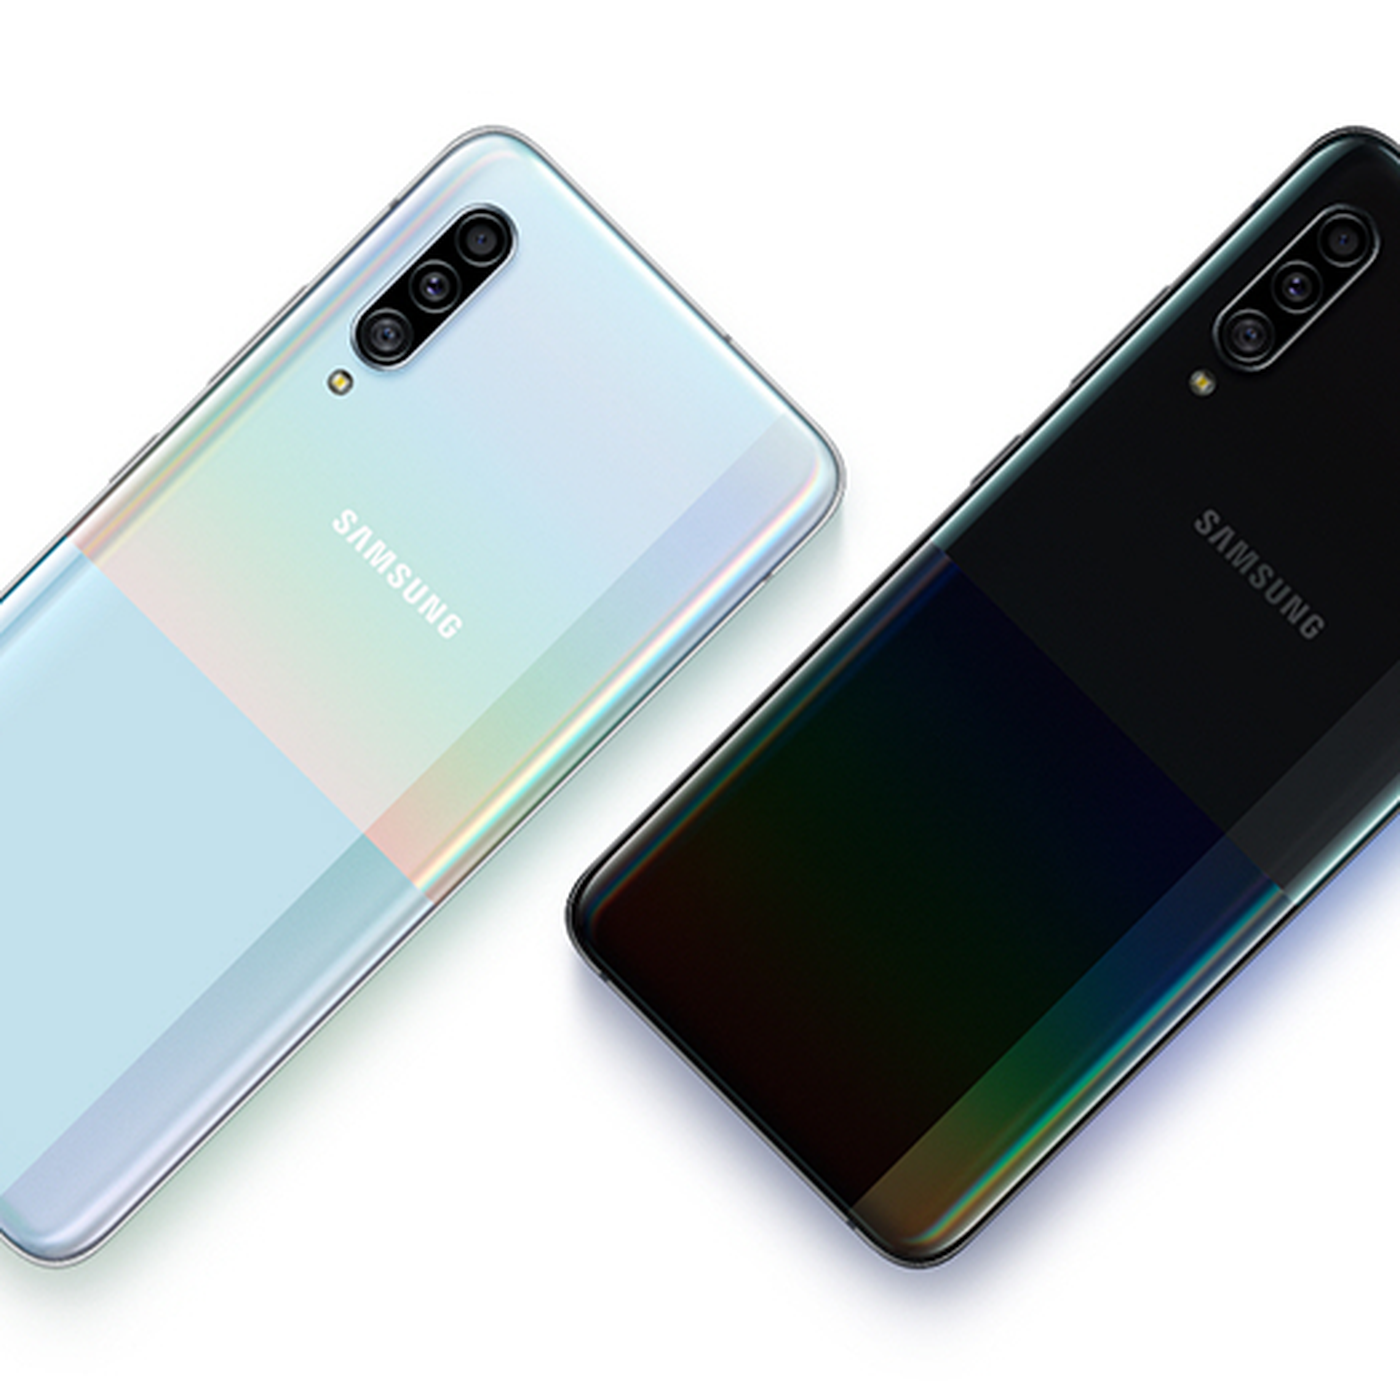 Samsung S Galaxy A90 5g Is A Mid Range Phone With Next Gen Speeds The Verge